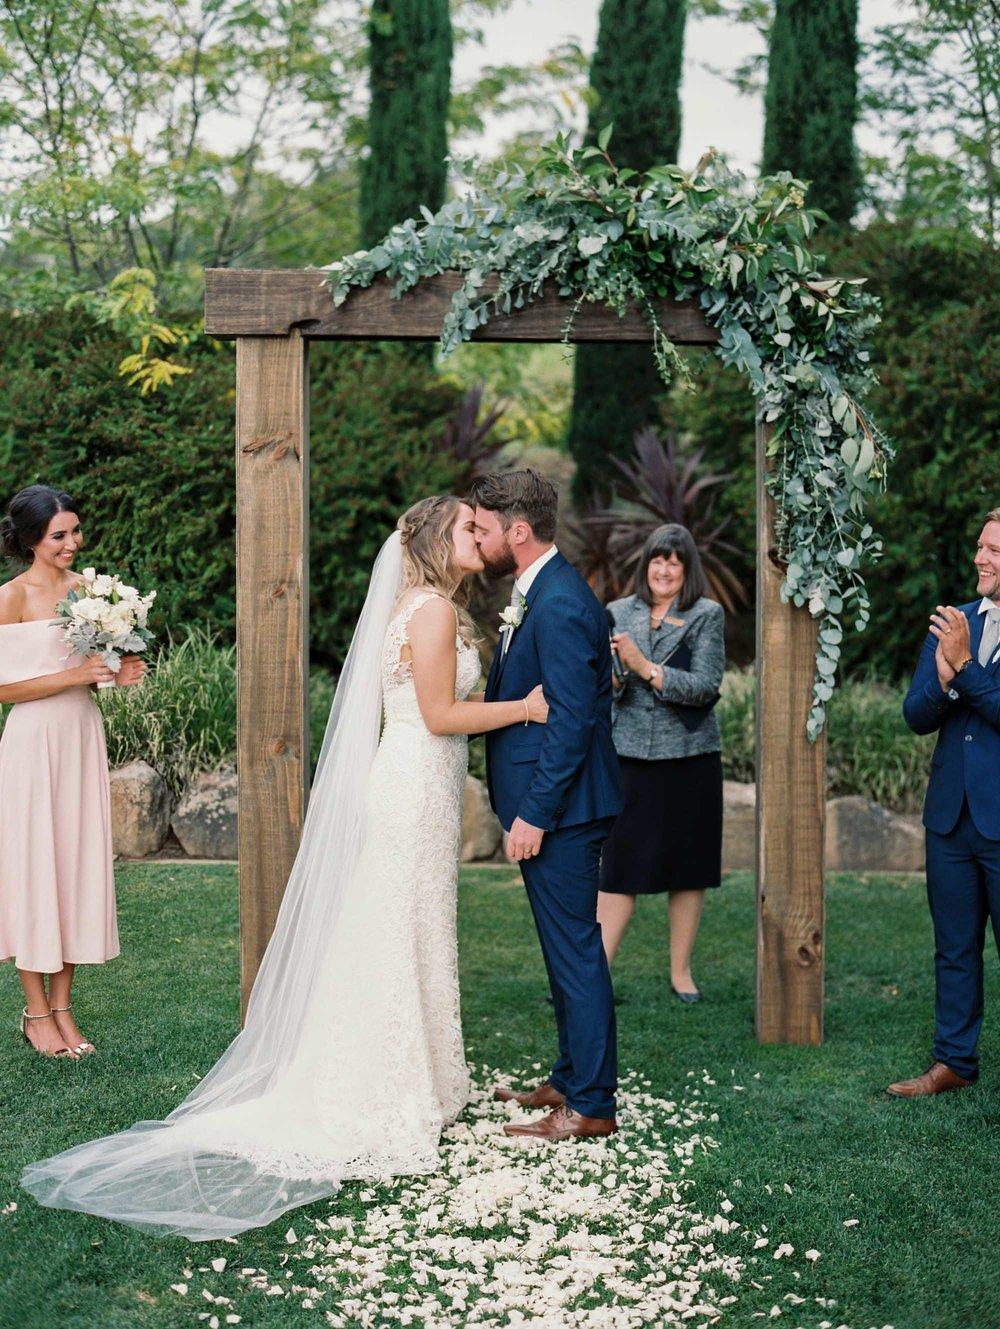 Golding-Wines-wedding-photography-057.jpg